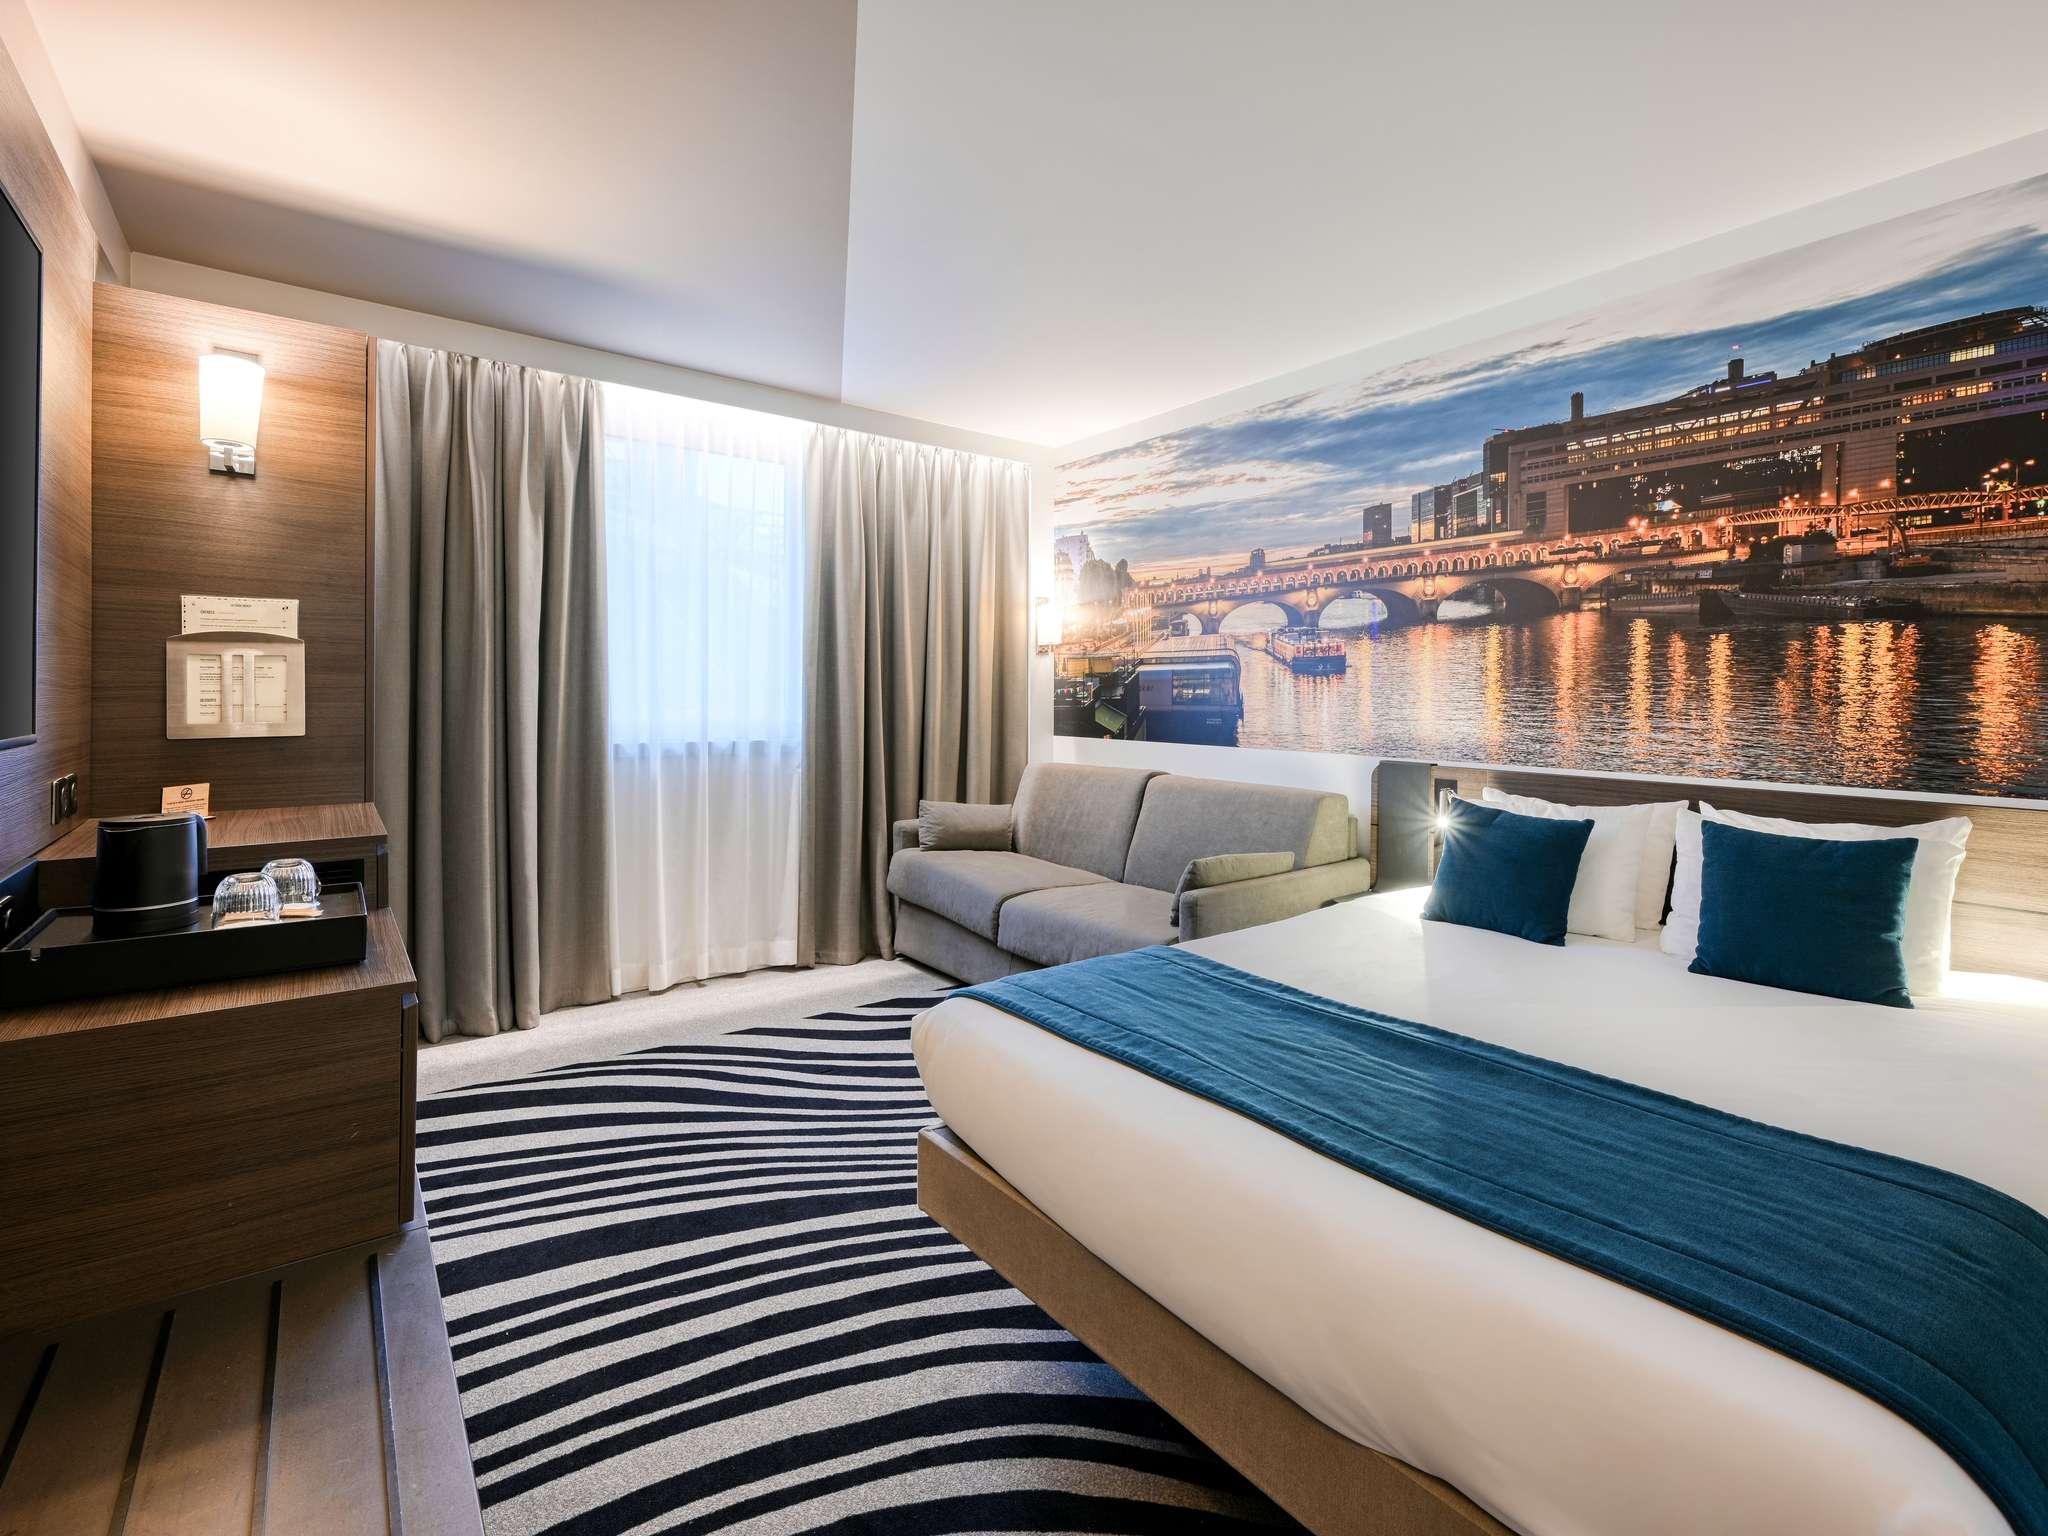 Hotel – Novotel Paris Centre Bercy